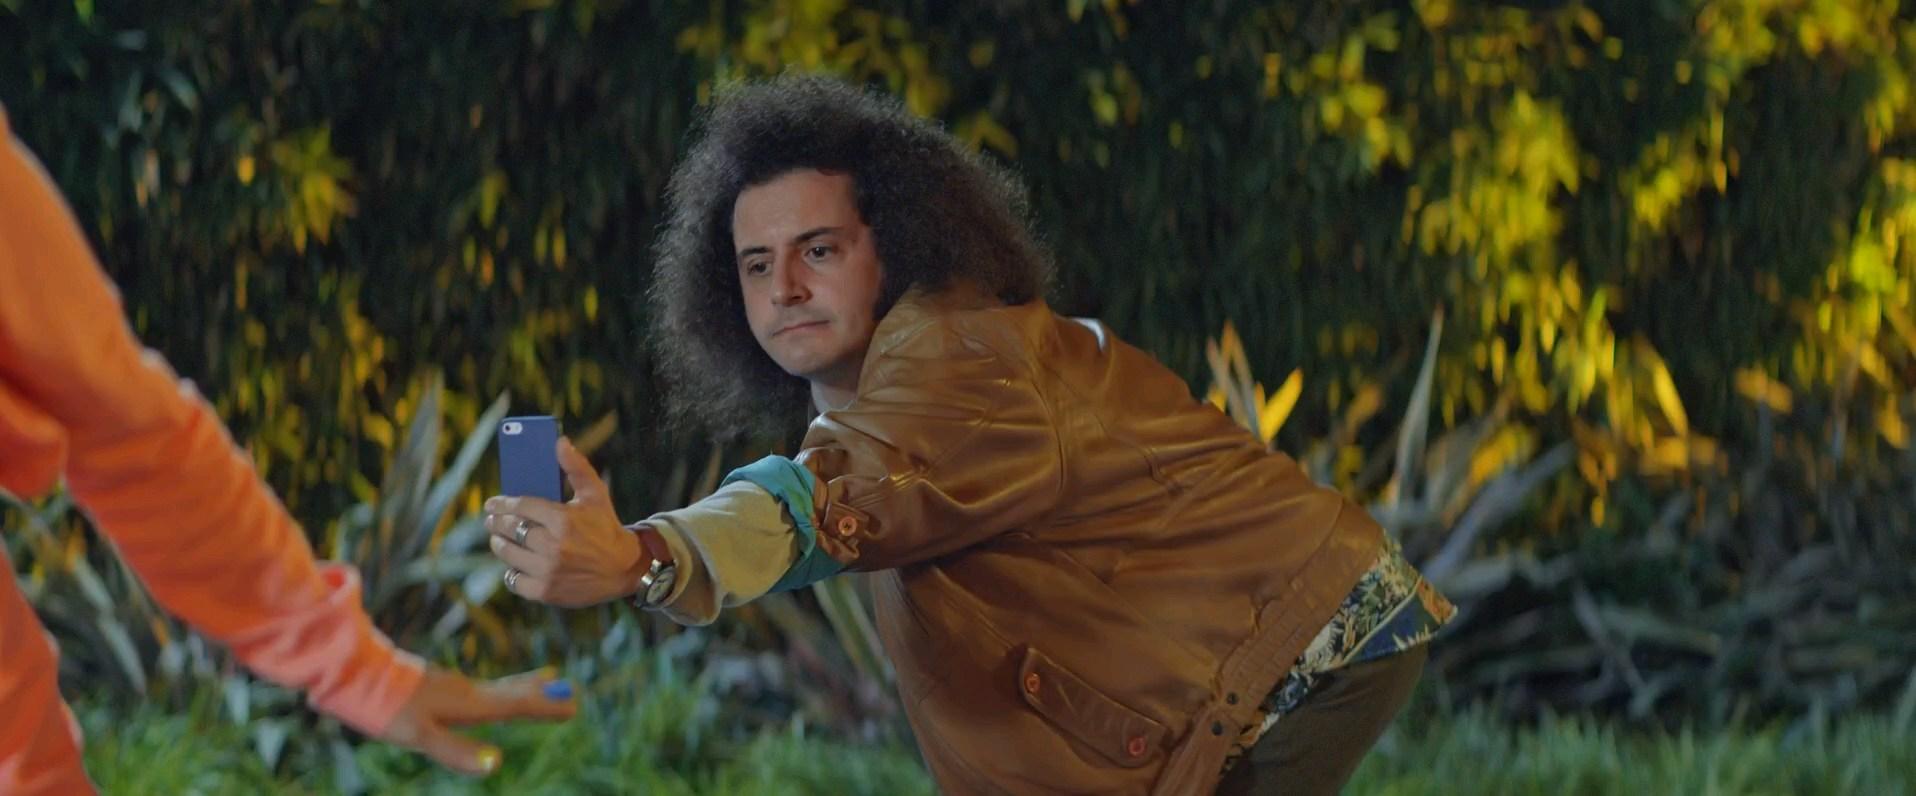 Feride | 2020 | Yerli Film | WEB-DL | XviD | Sansürsüz | 4K - 1080p - m720p - m1080p | WEB-DL | Tek Link